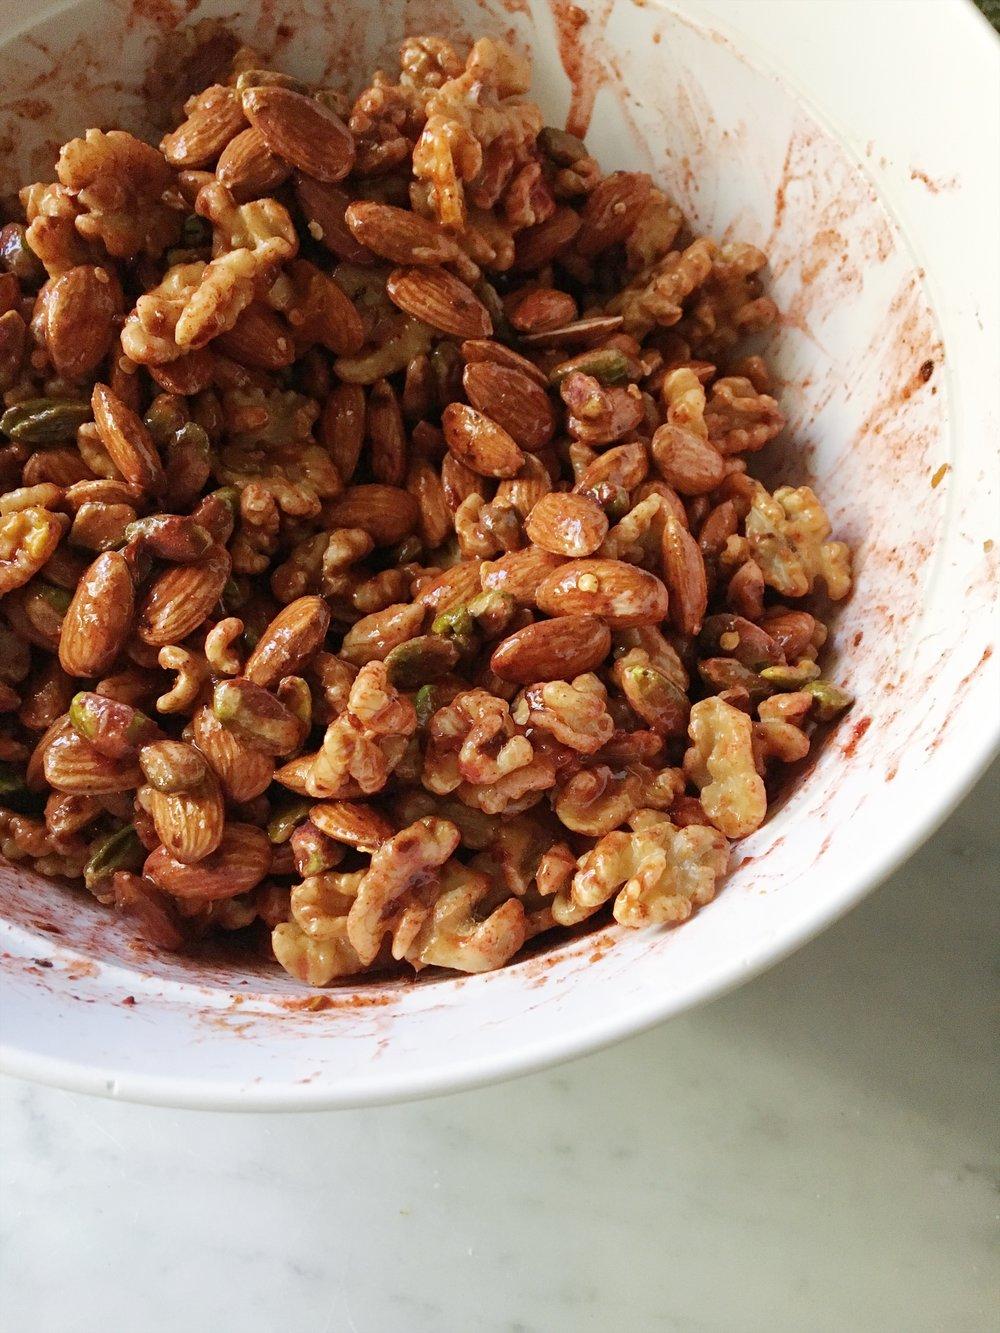 MEAL PREP SNACK RECIPE: Tandoori Spiced Nuts